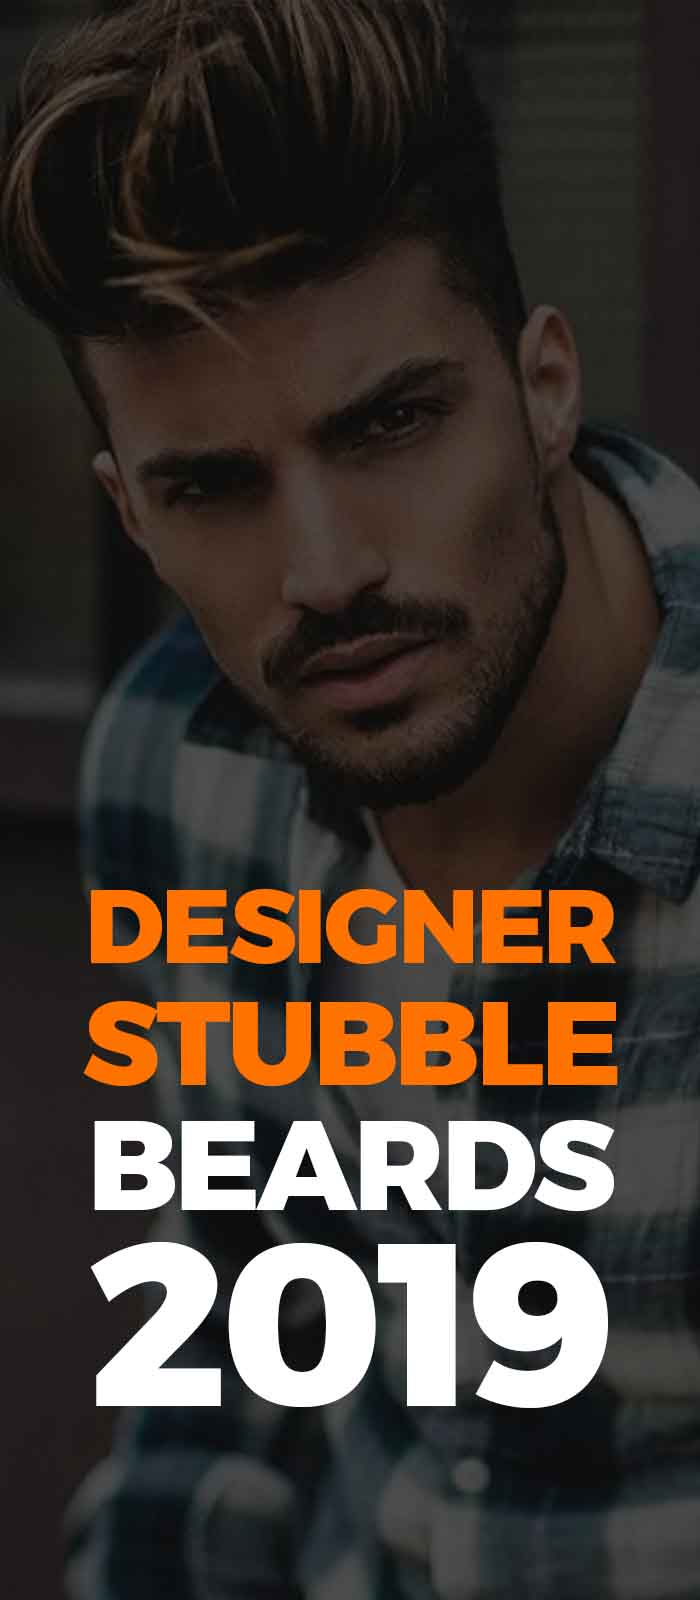 Perfect Designer stubble!